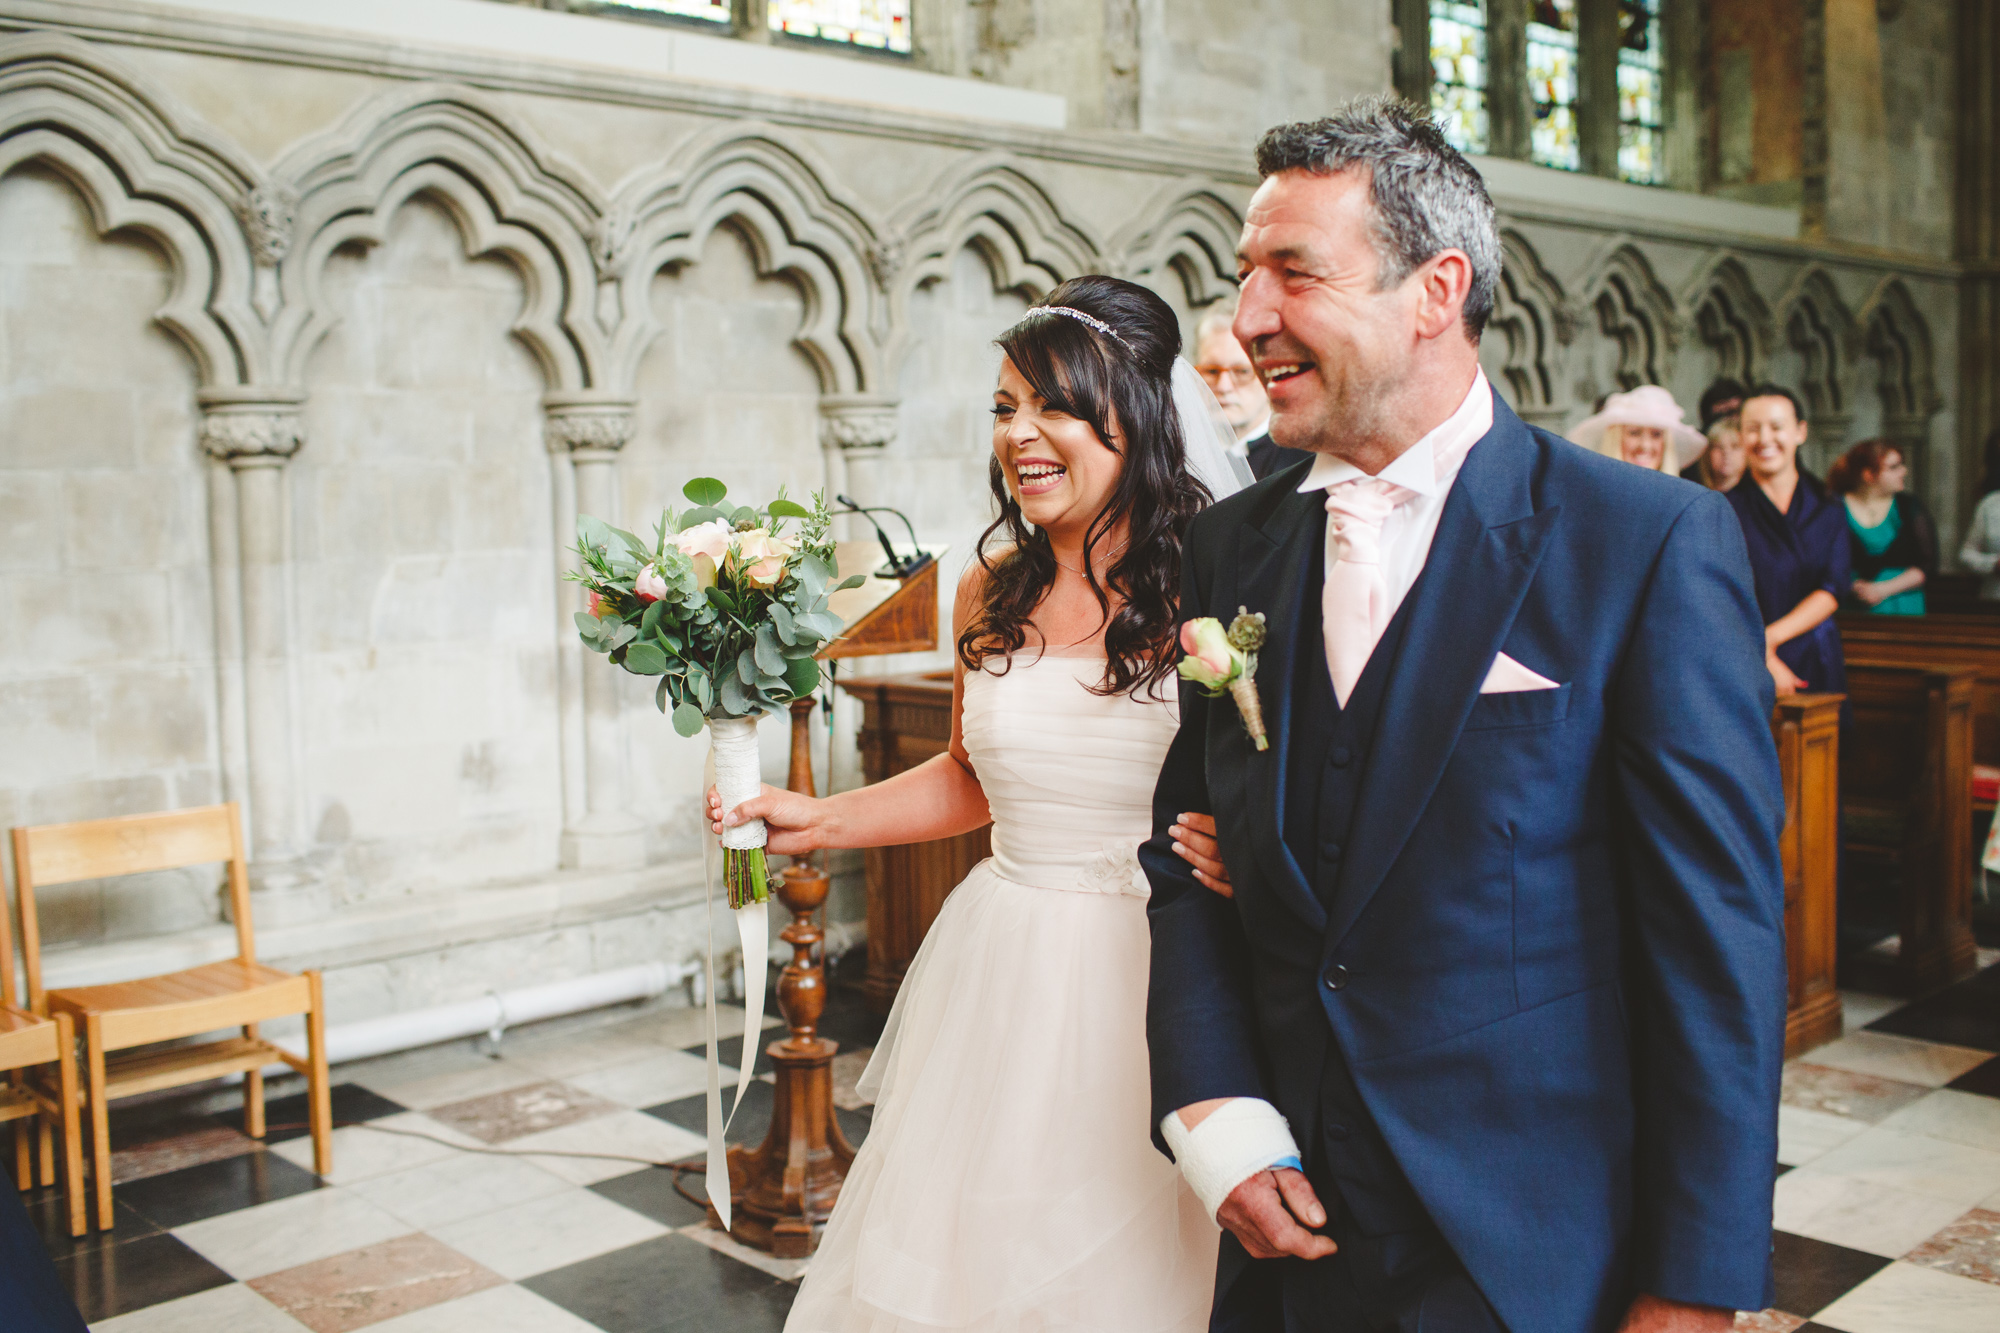 alternative-wedding-photographer-uk-camera-hannah-5.jpg